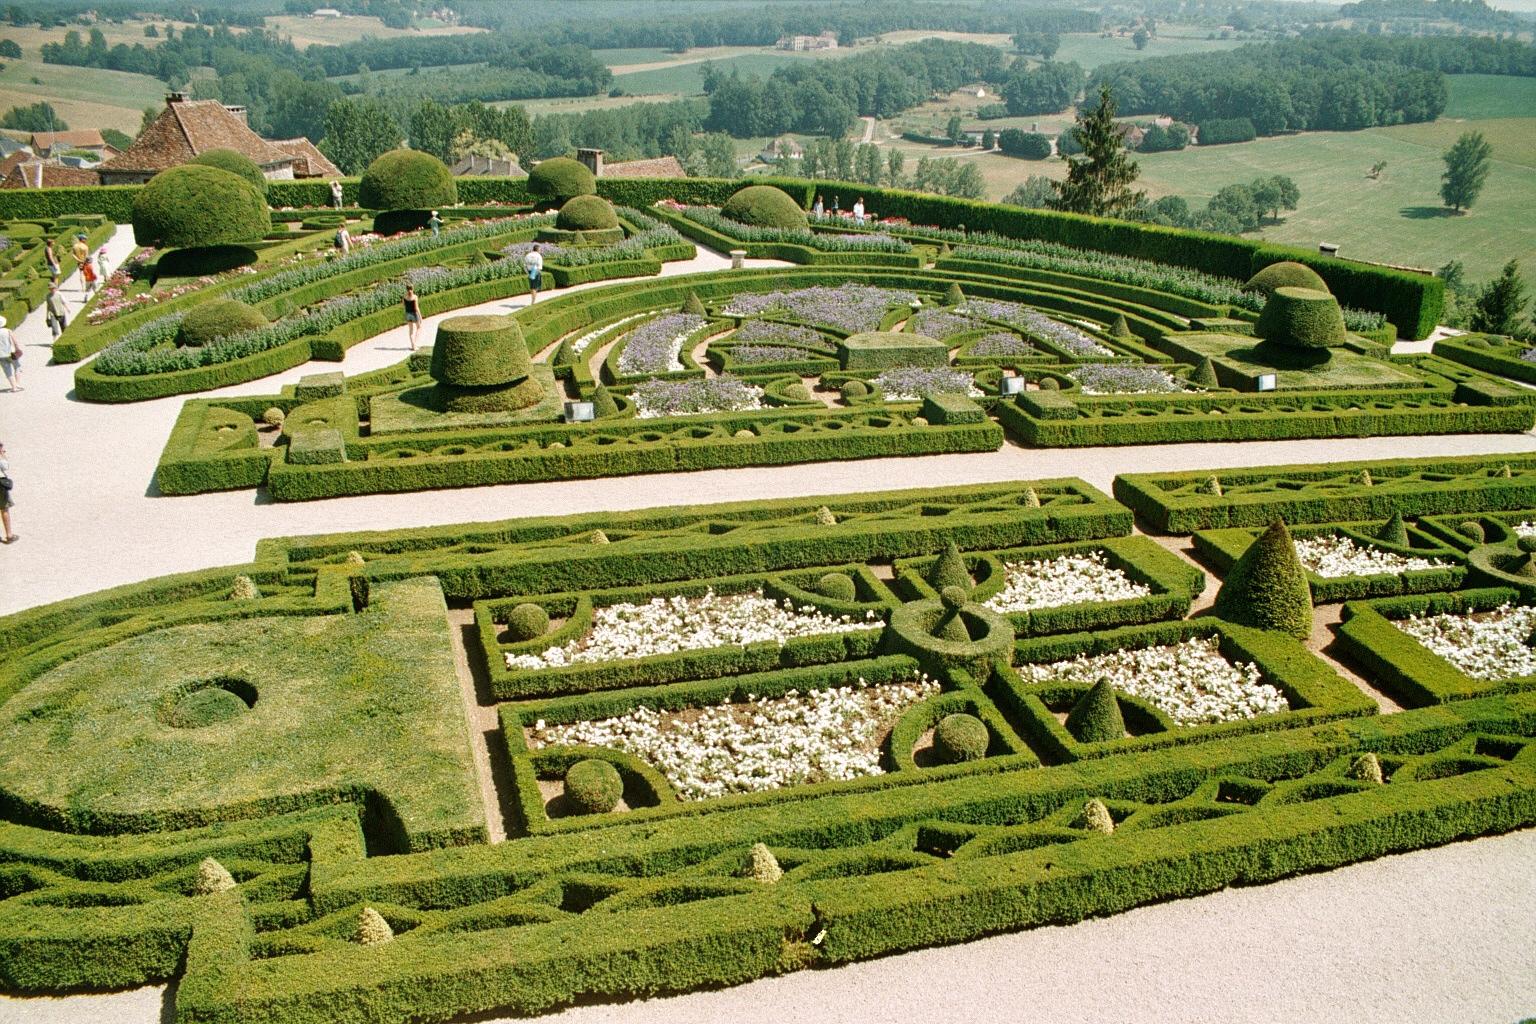 Renaissancegarten